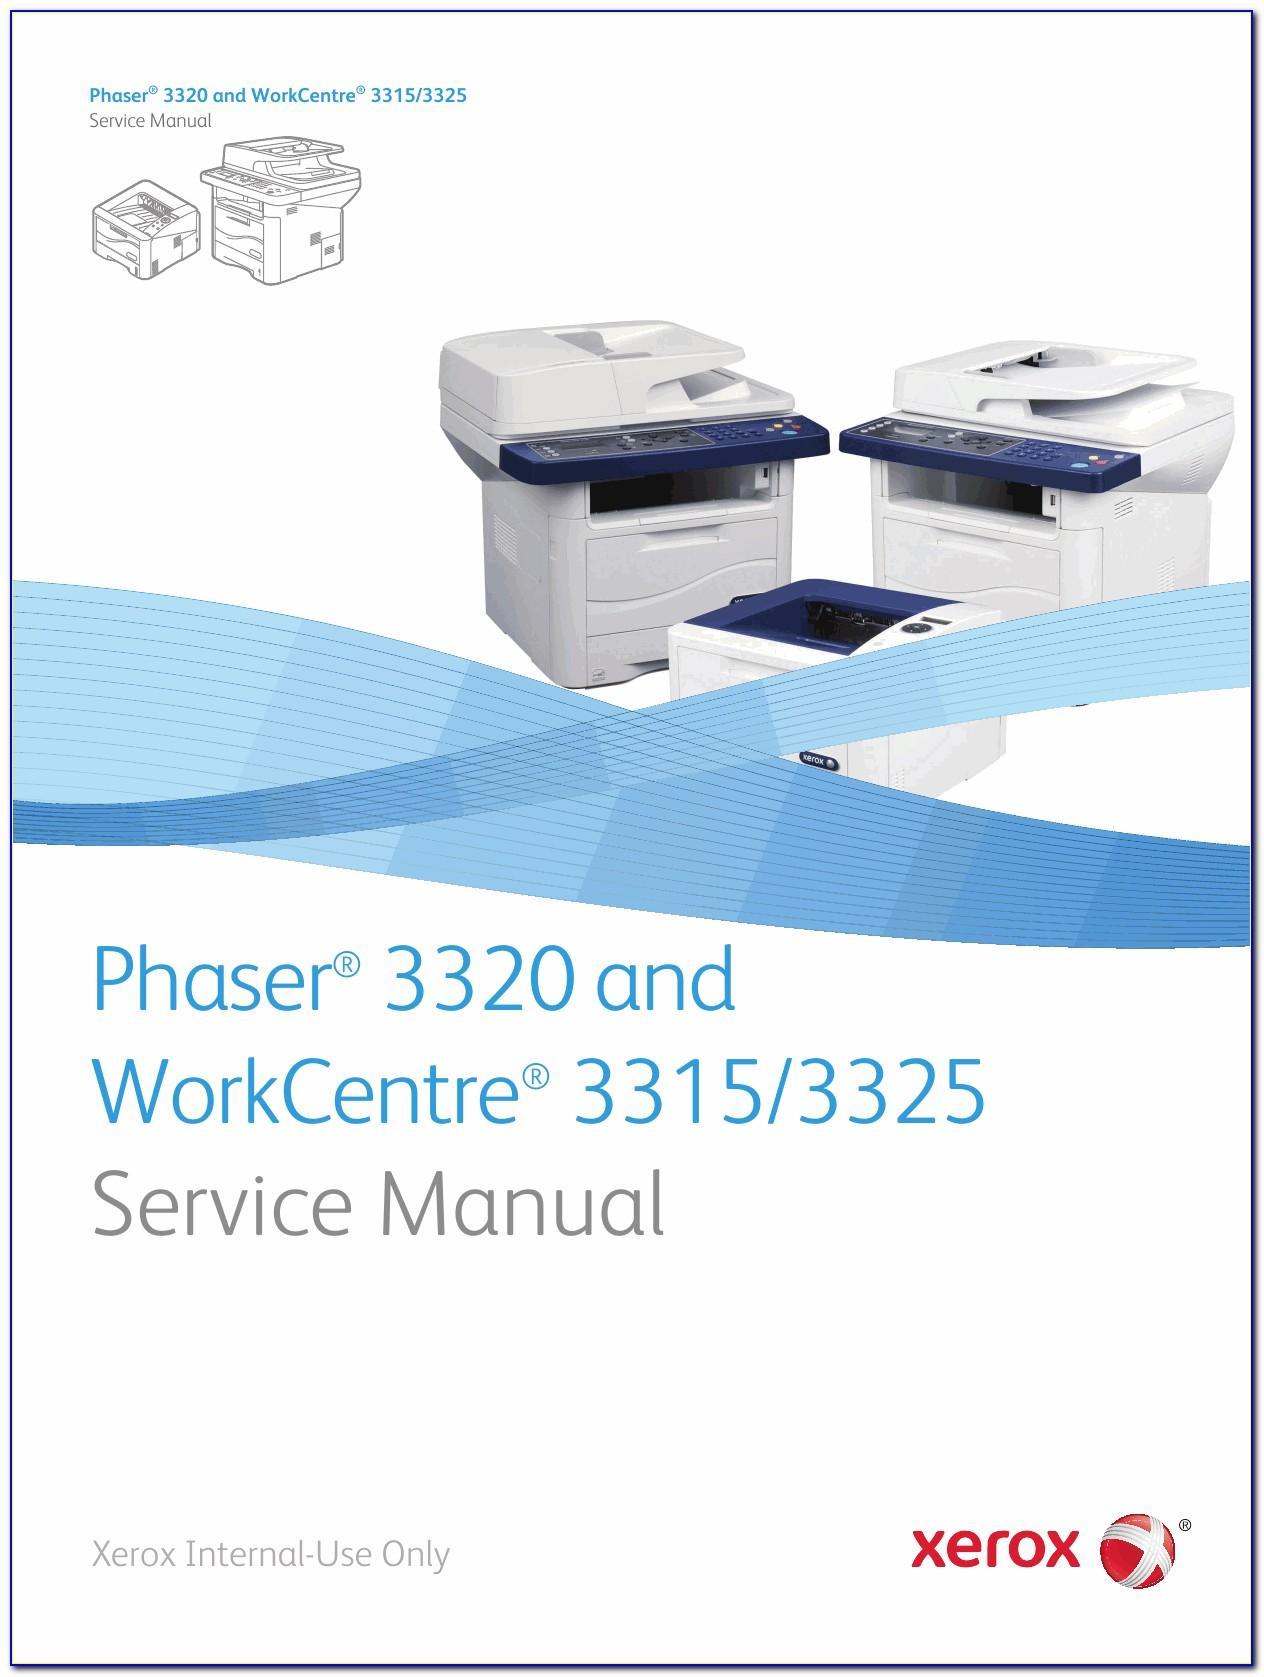 Xerox 3325 Manual Español